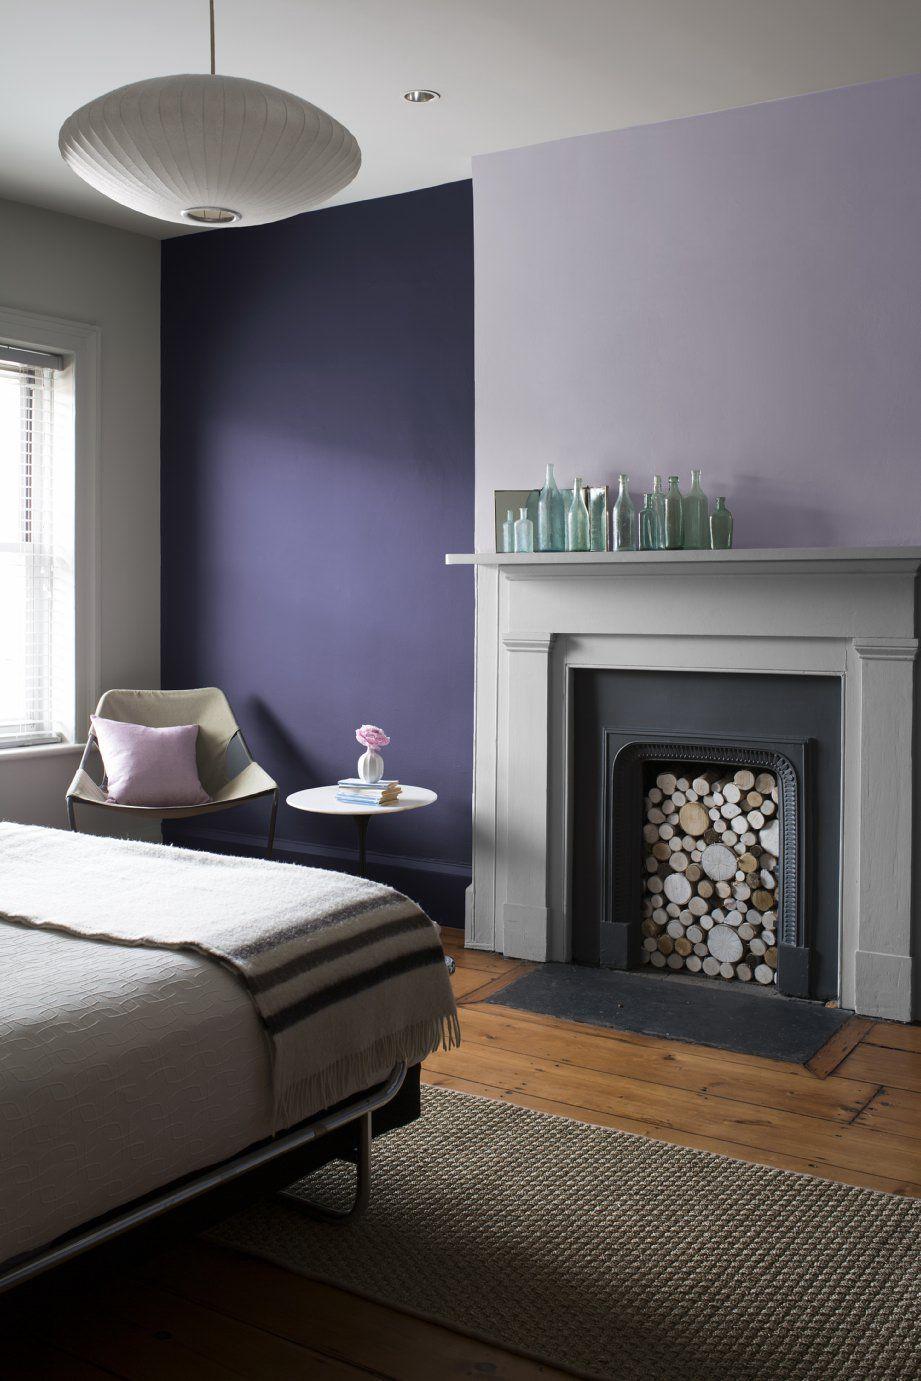 Bedroom Color Ideas Inspiration Lavender Bedroom Bedroom Wall Bedroom Accents Color